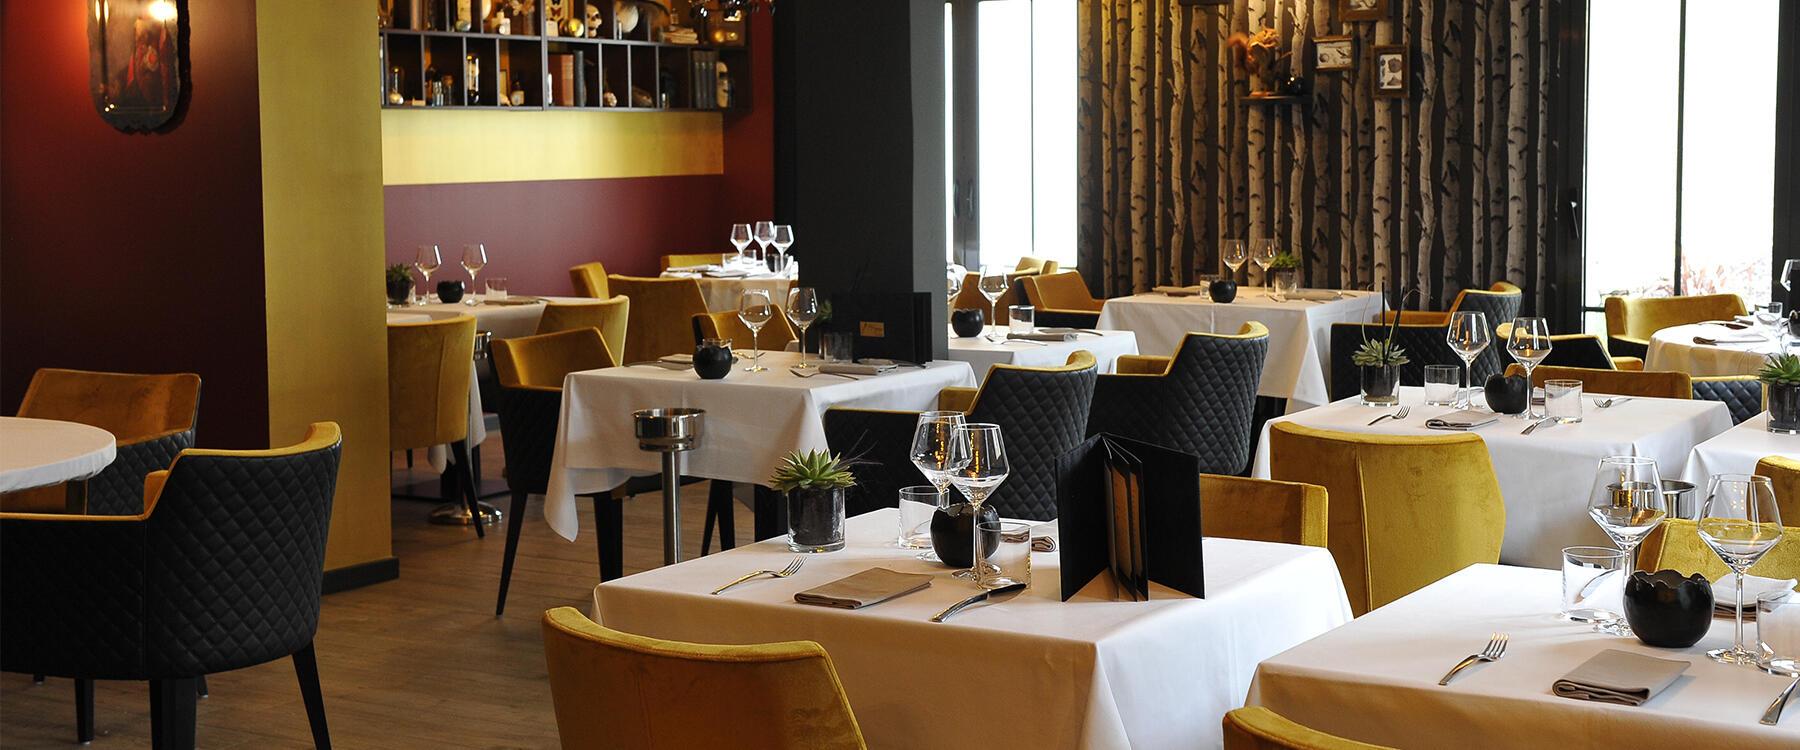 L Hysope Gourmet Restaurant La Jarrie